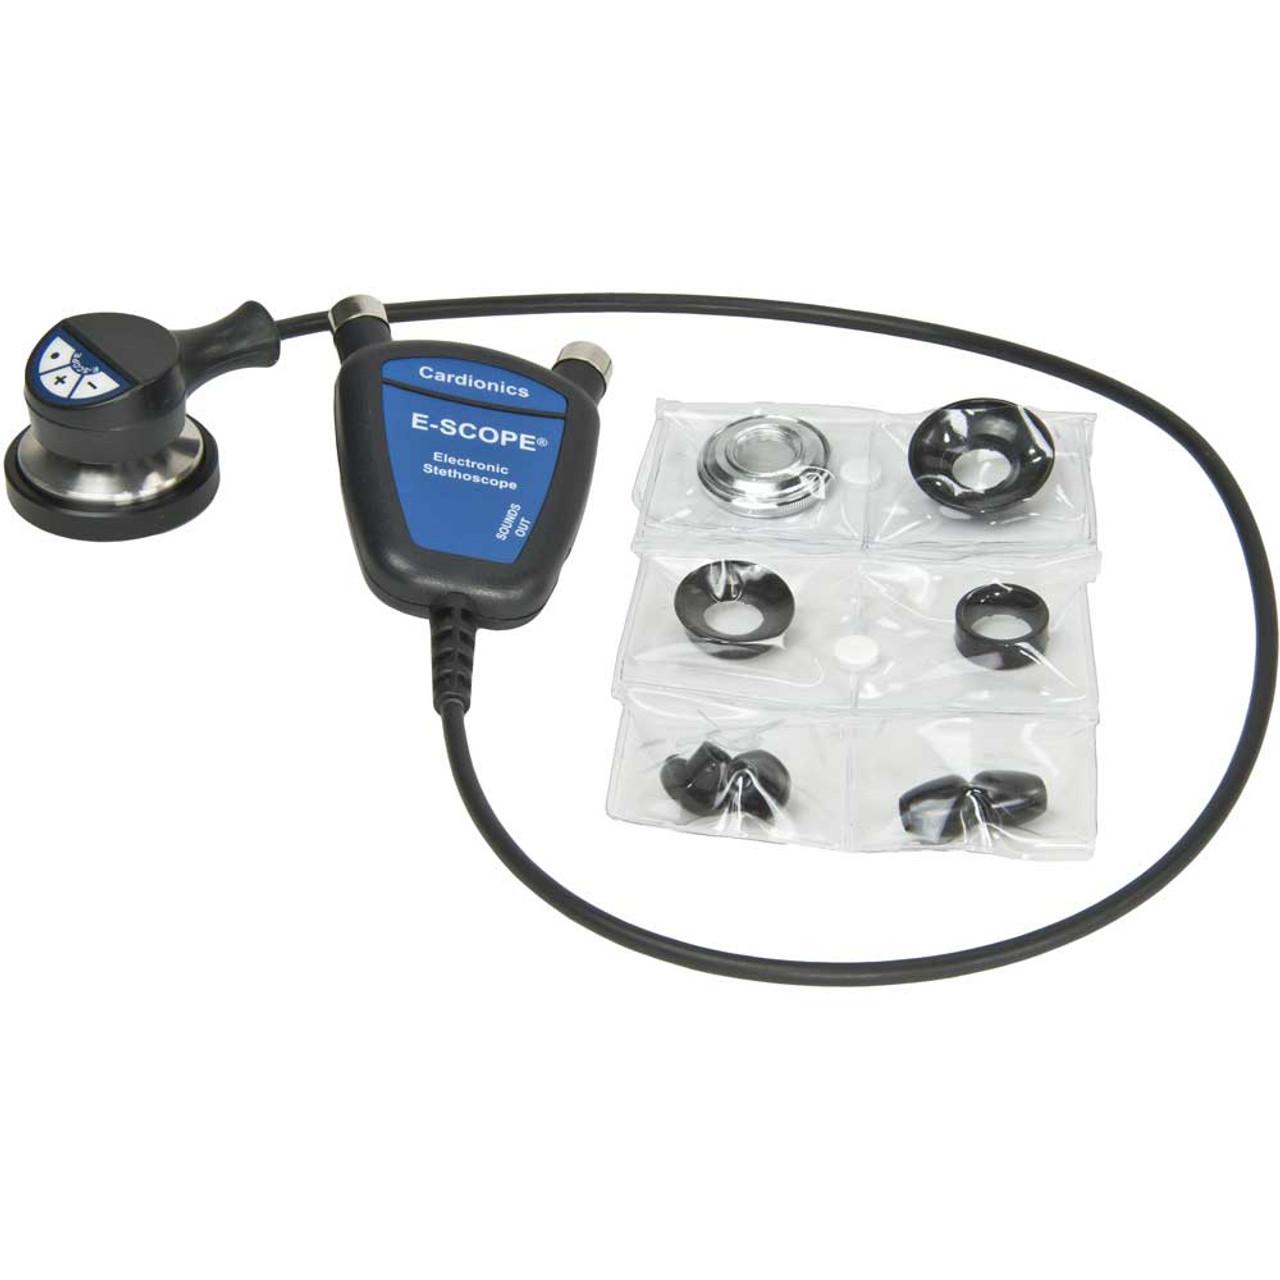 Cardionics E-Scope II Headphone Model